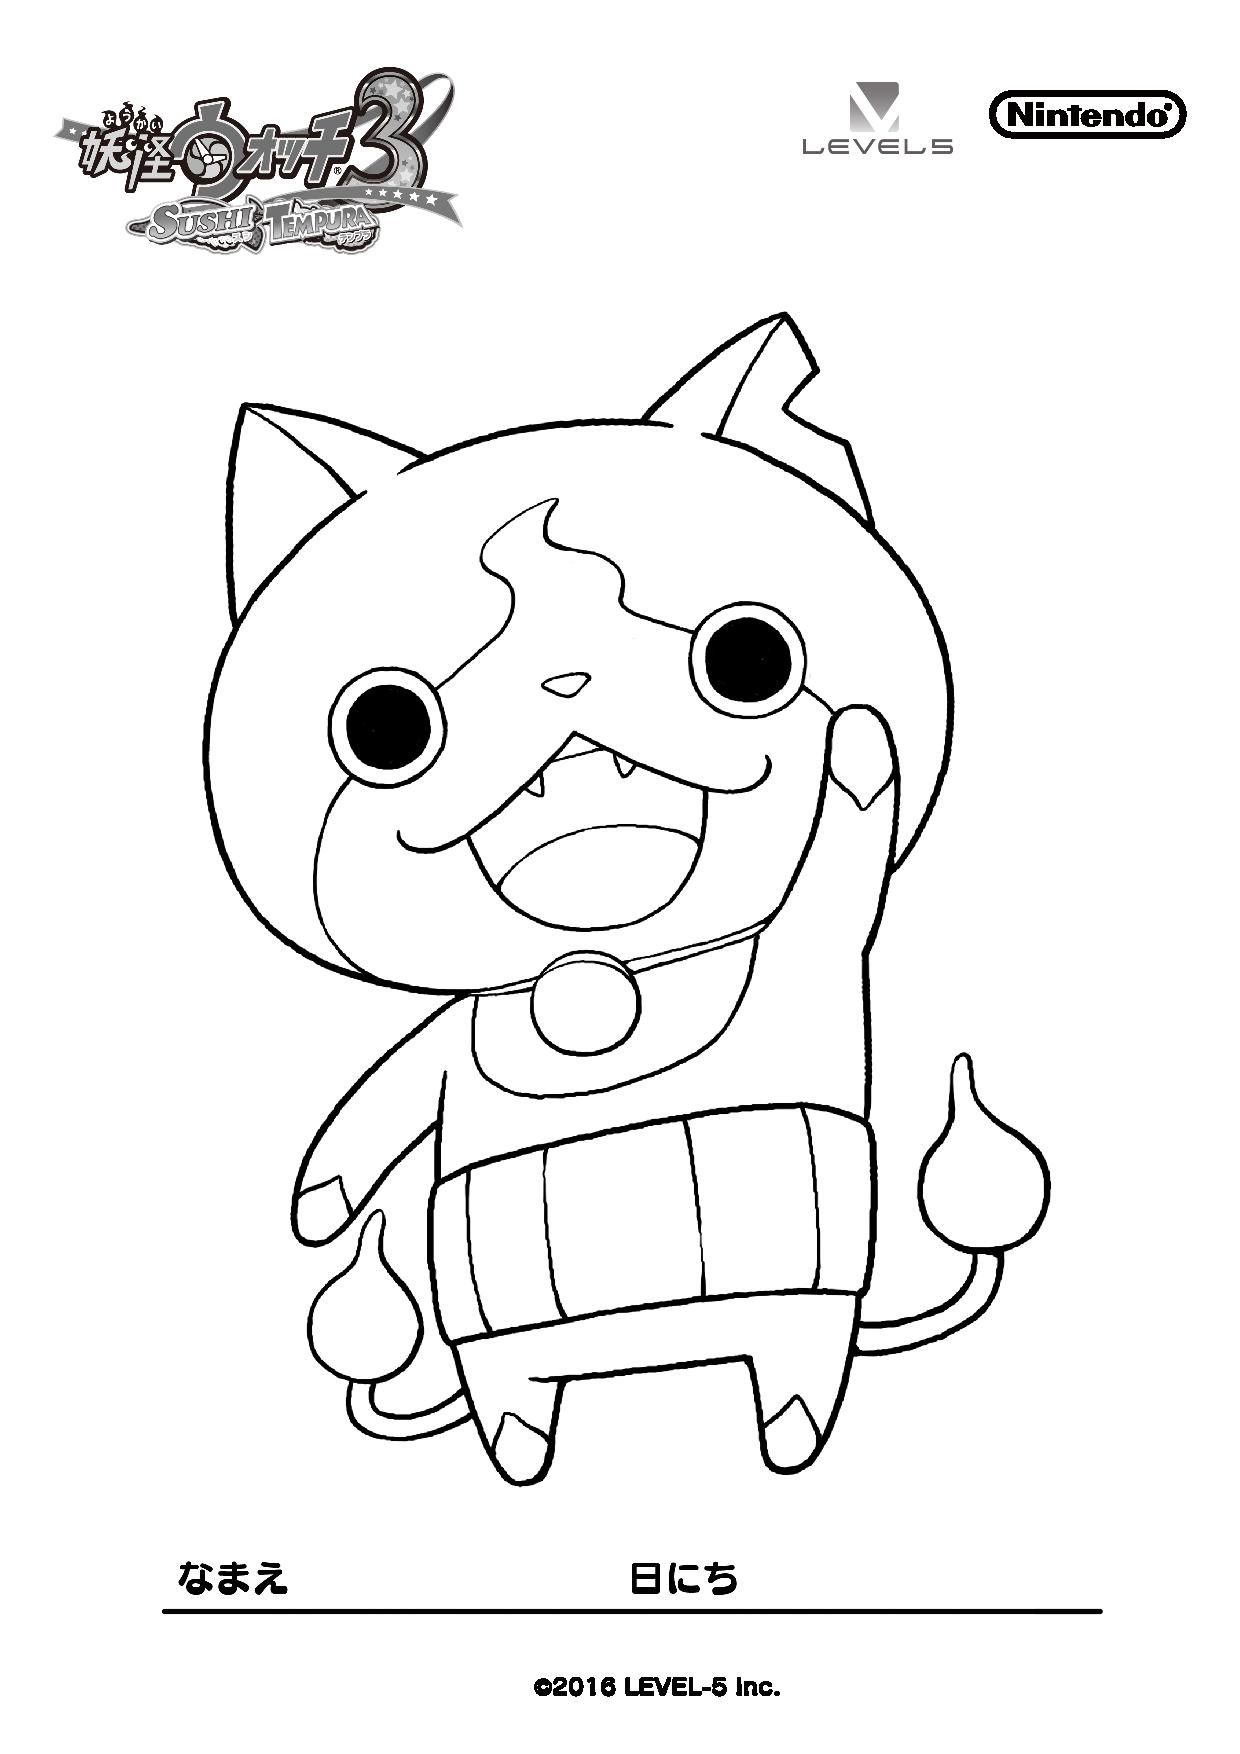 Coloring pages yokai - Yo Kai Watch 3 Free Coloring Book Pages Gonintendo